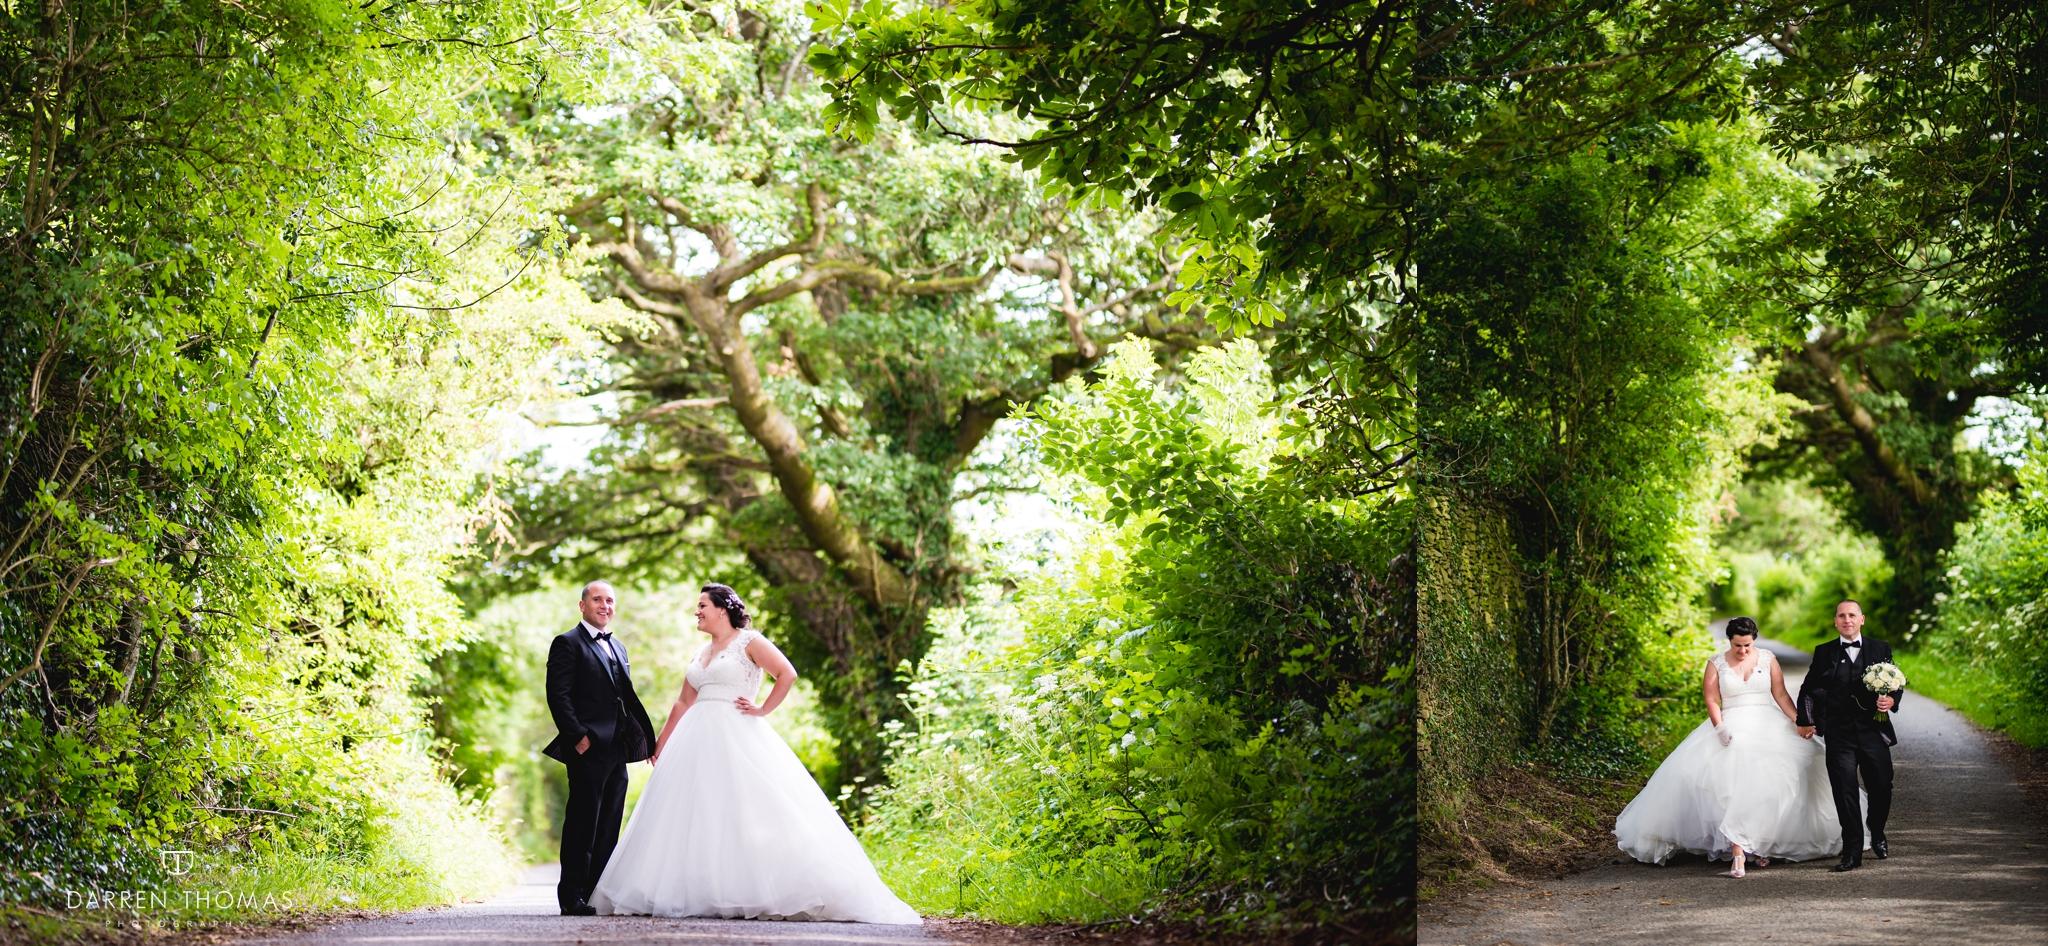 Llechwen-hall-wedding-photography18.jpg